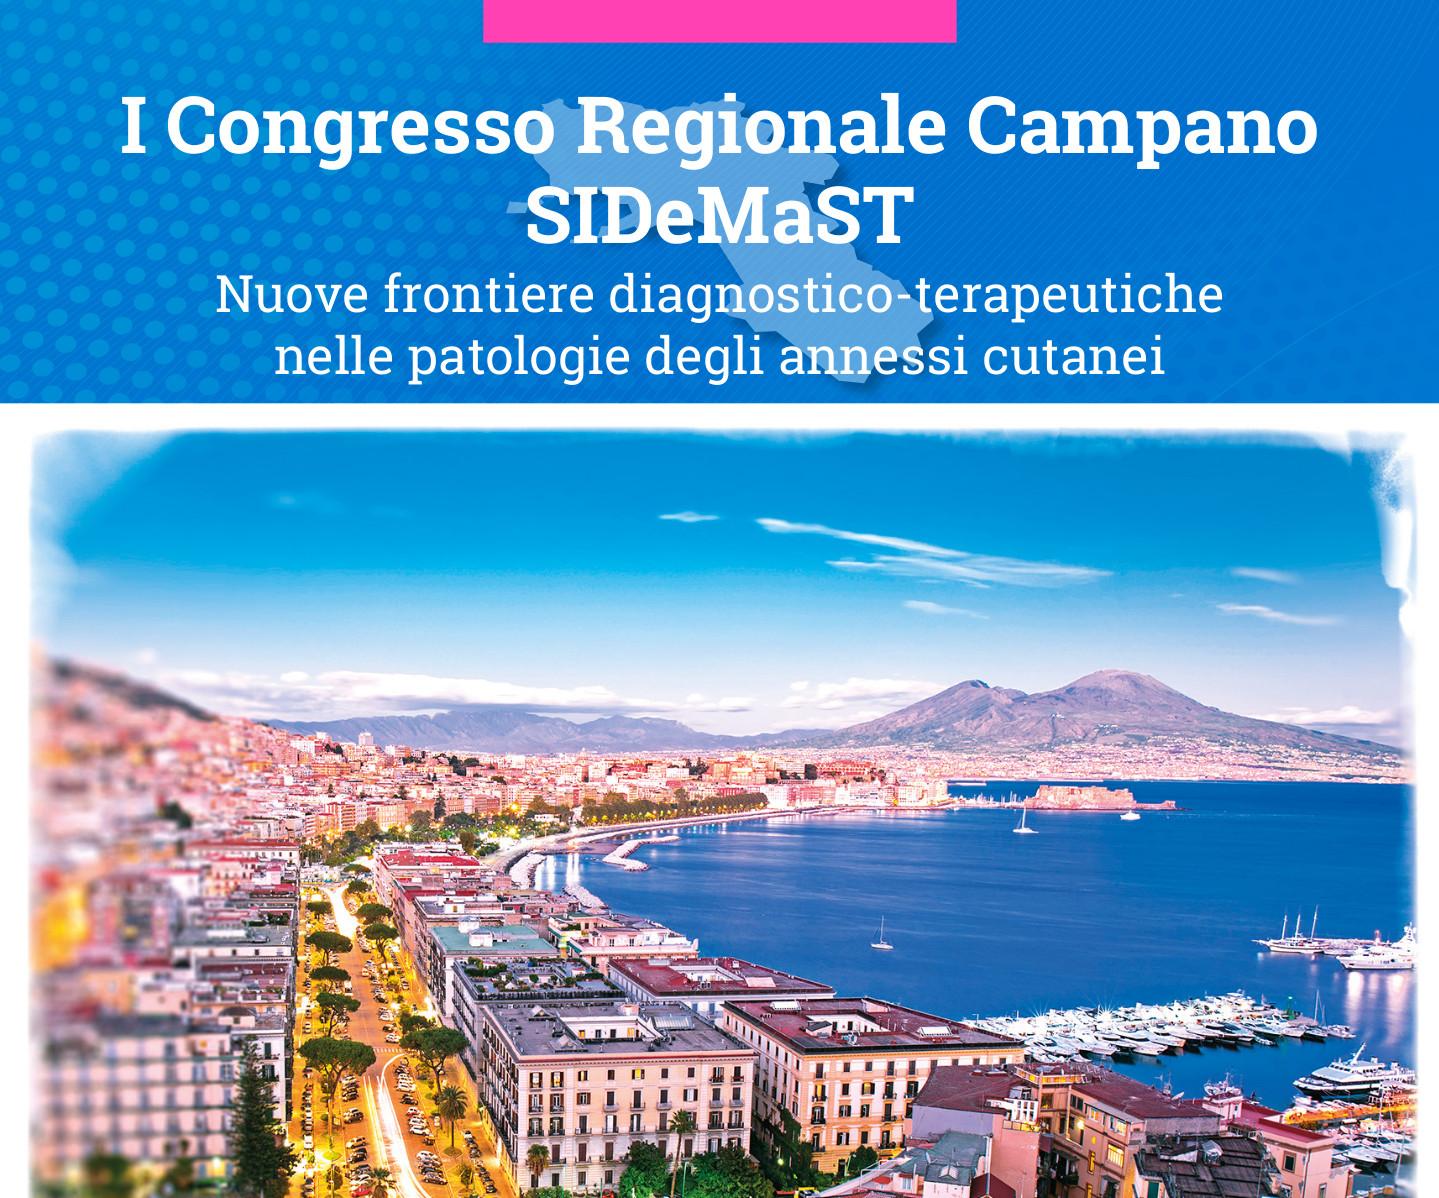 SIDeMaST - I Congresso Regionale Campano